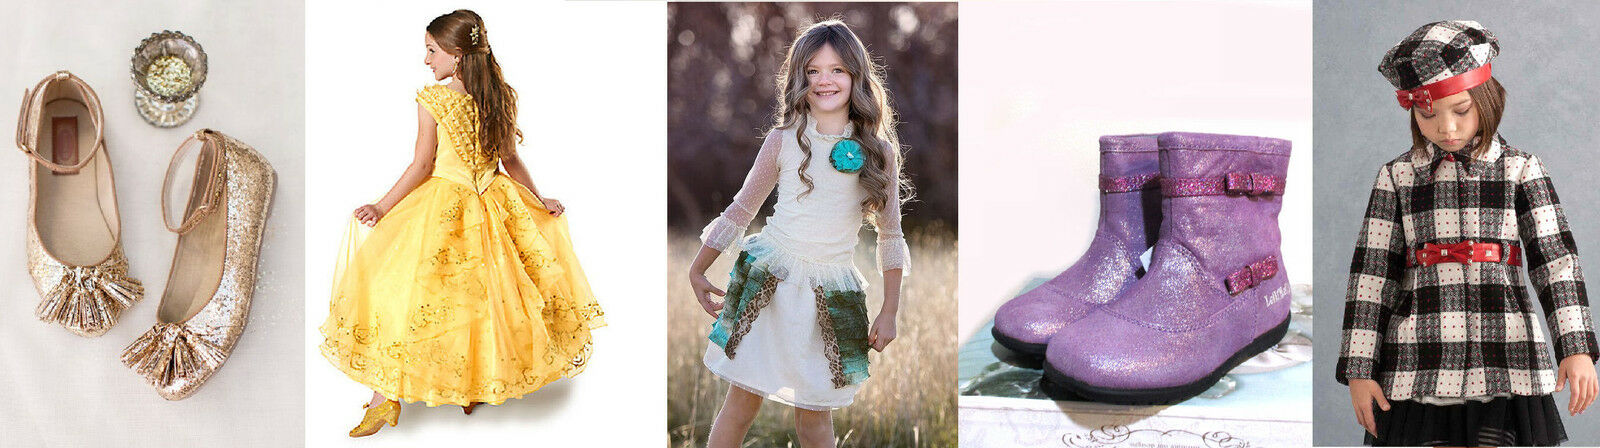 A La Mode Fashions for Kids & Adult